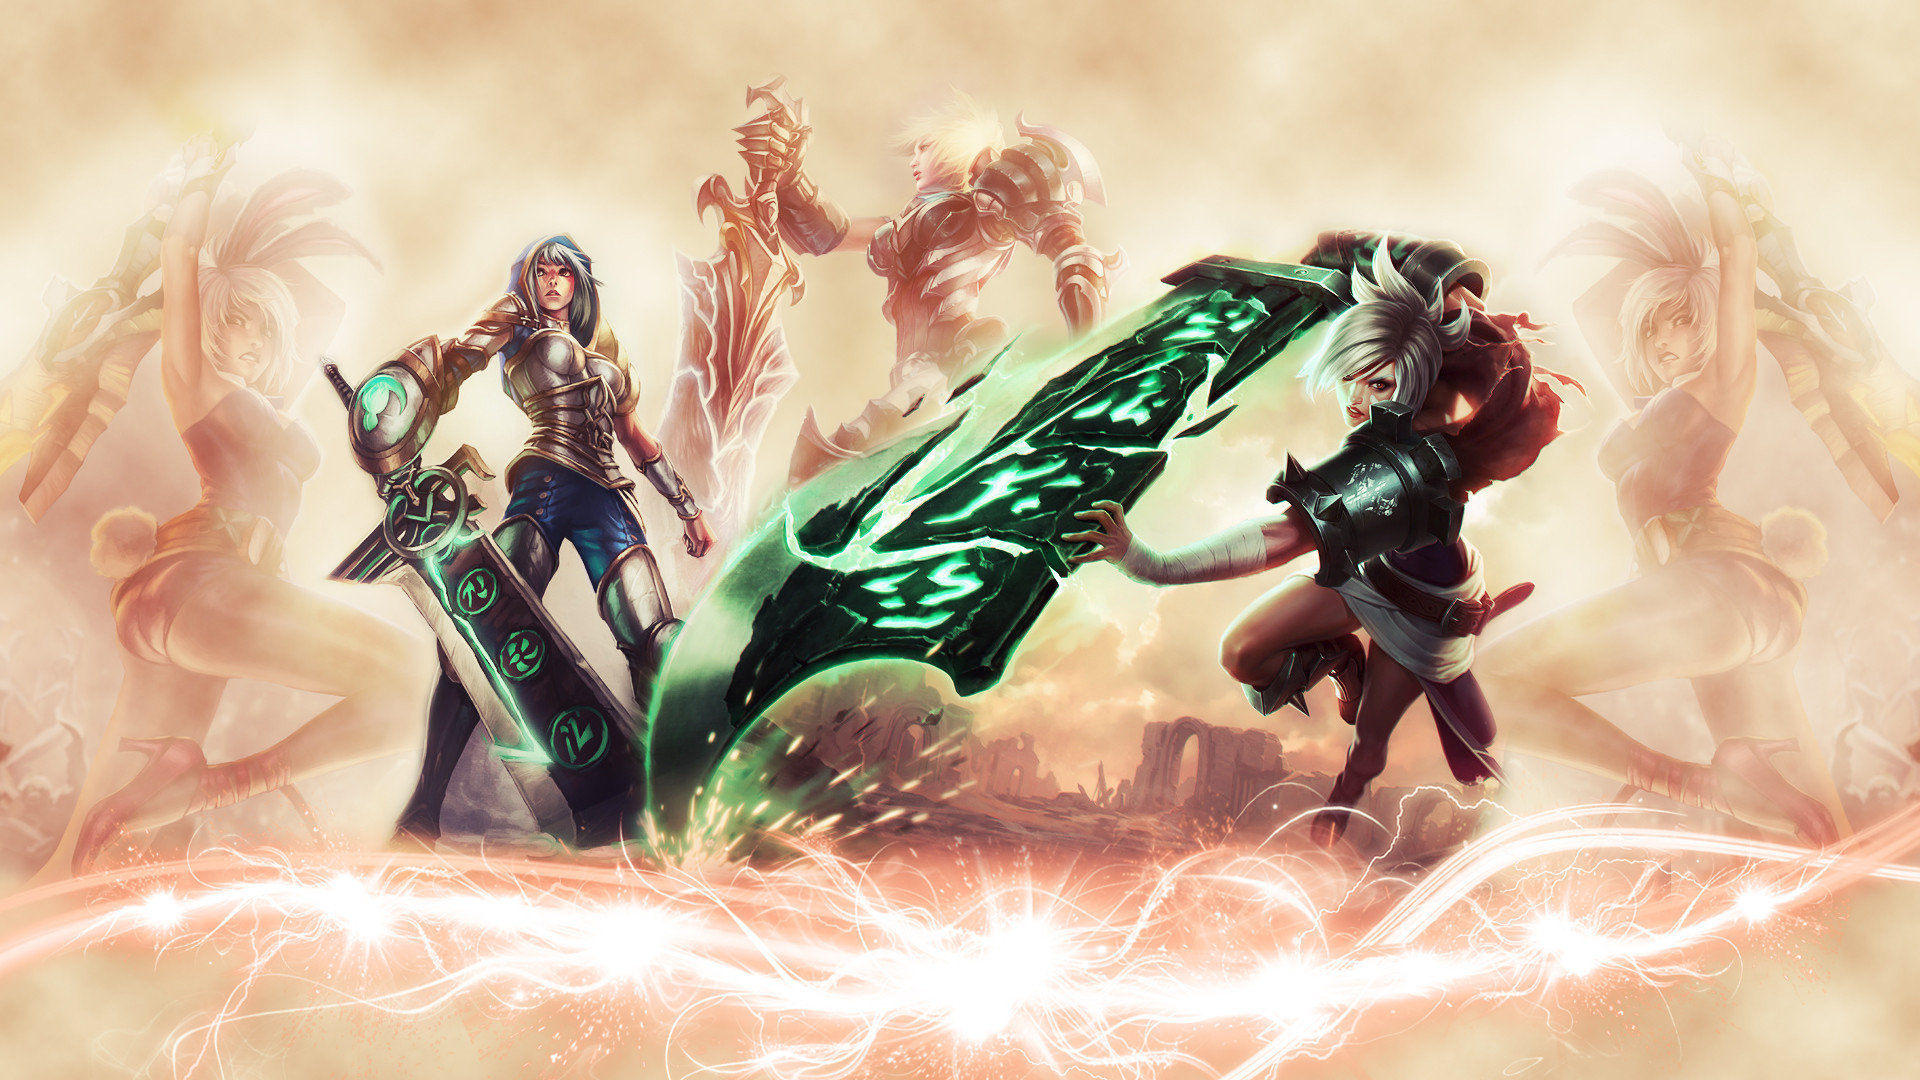 Riven League Of Legends Wallpapers Hd For Desktop Backgrounds